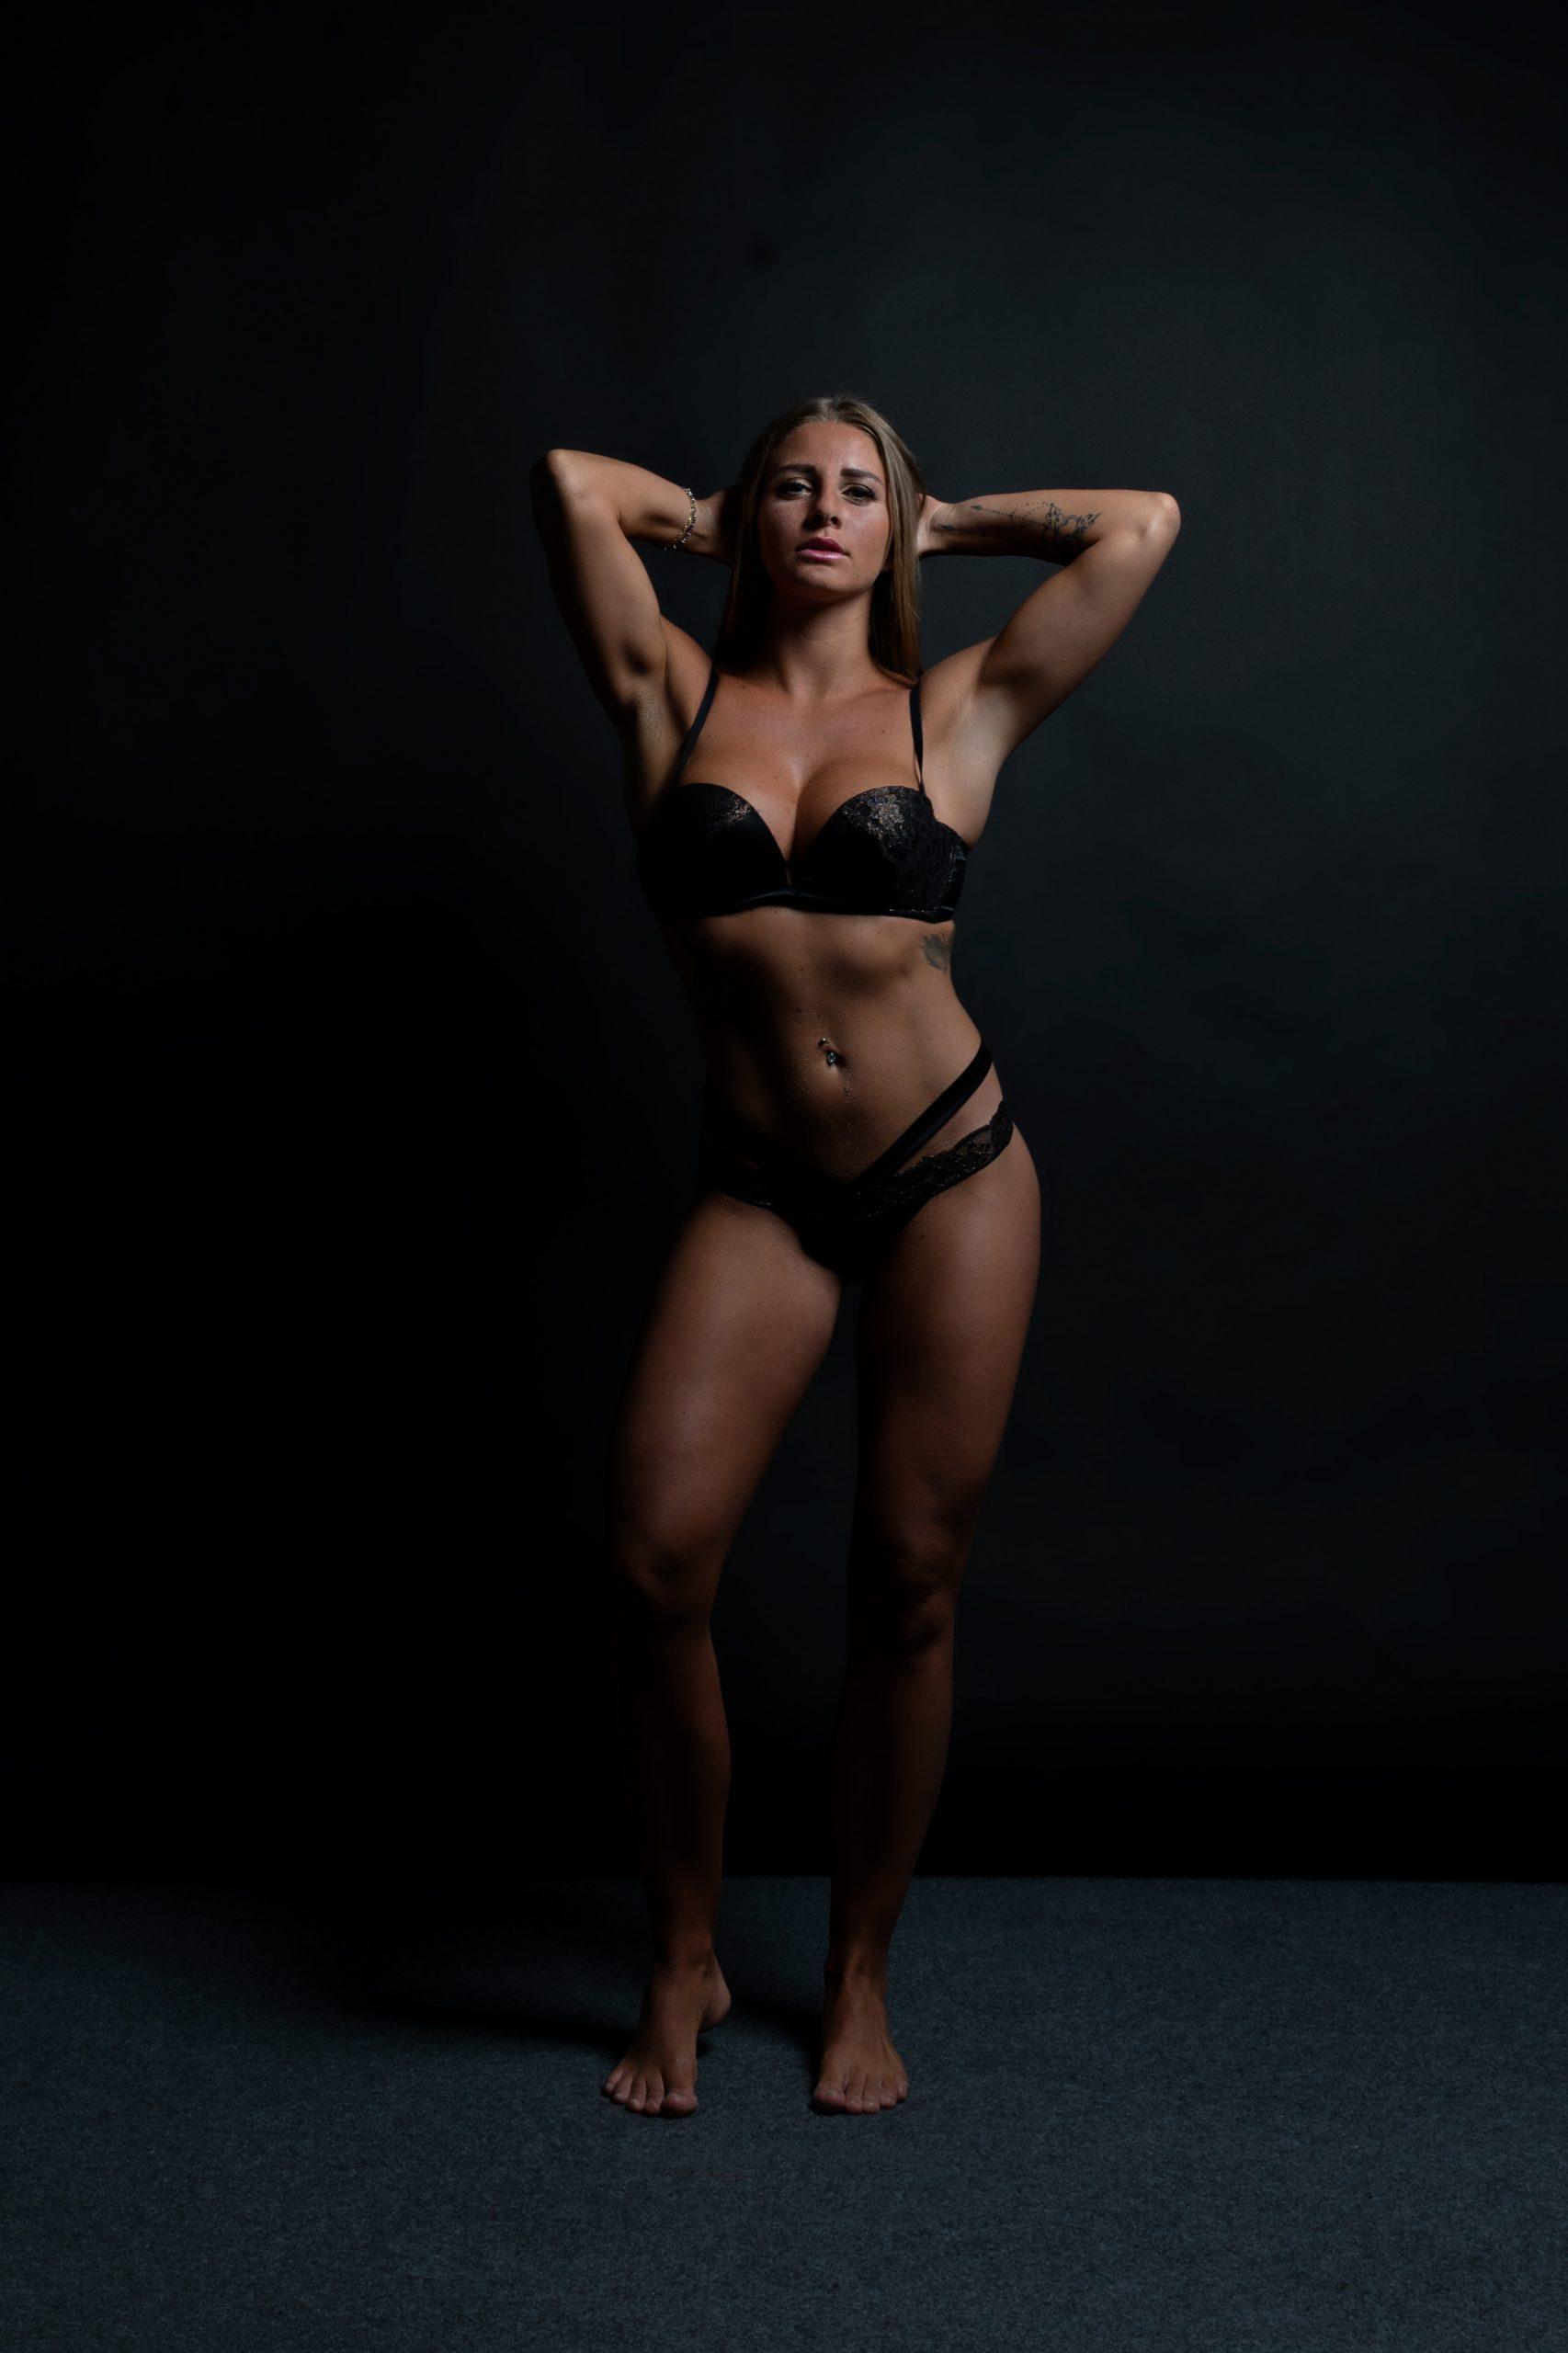 Valentina_Zamperoni_006-2